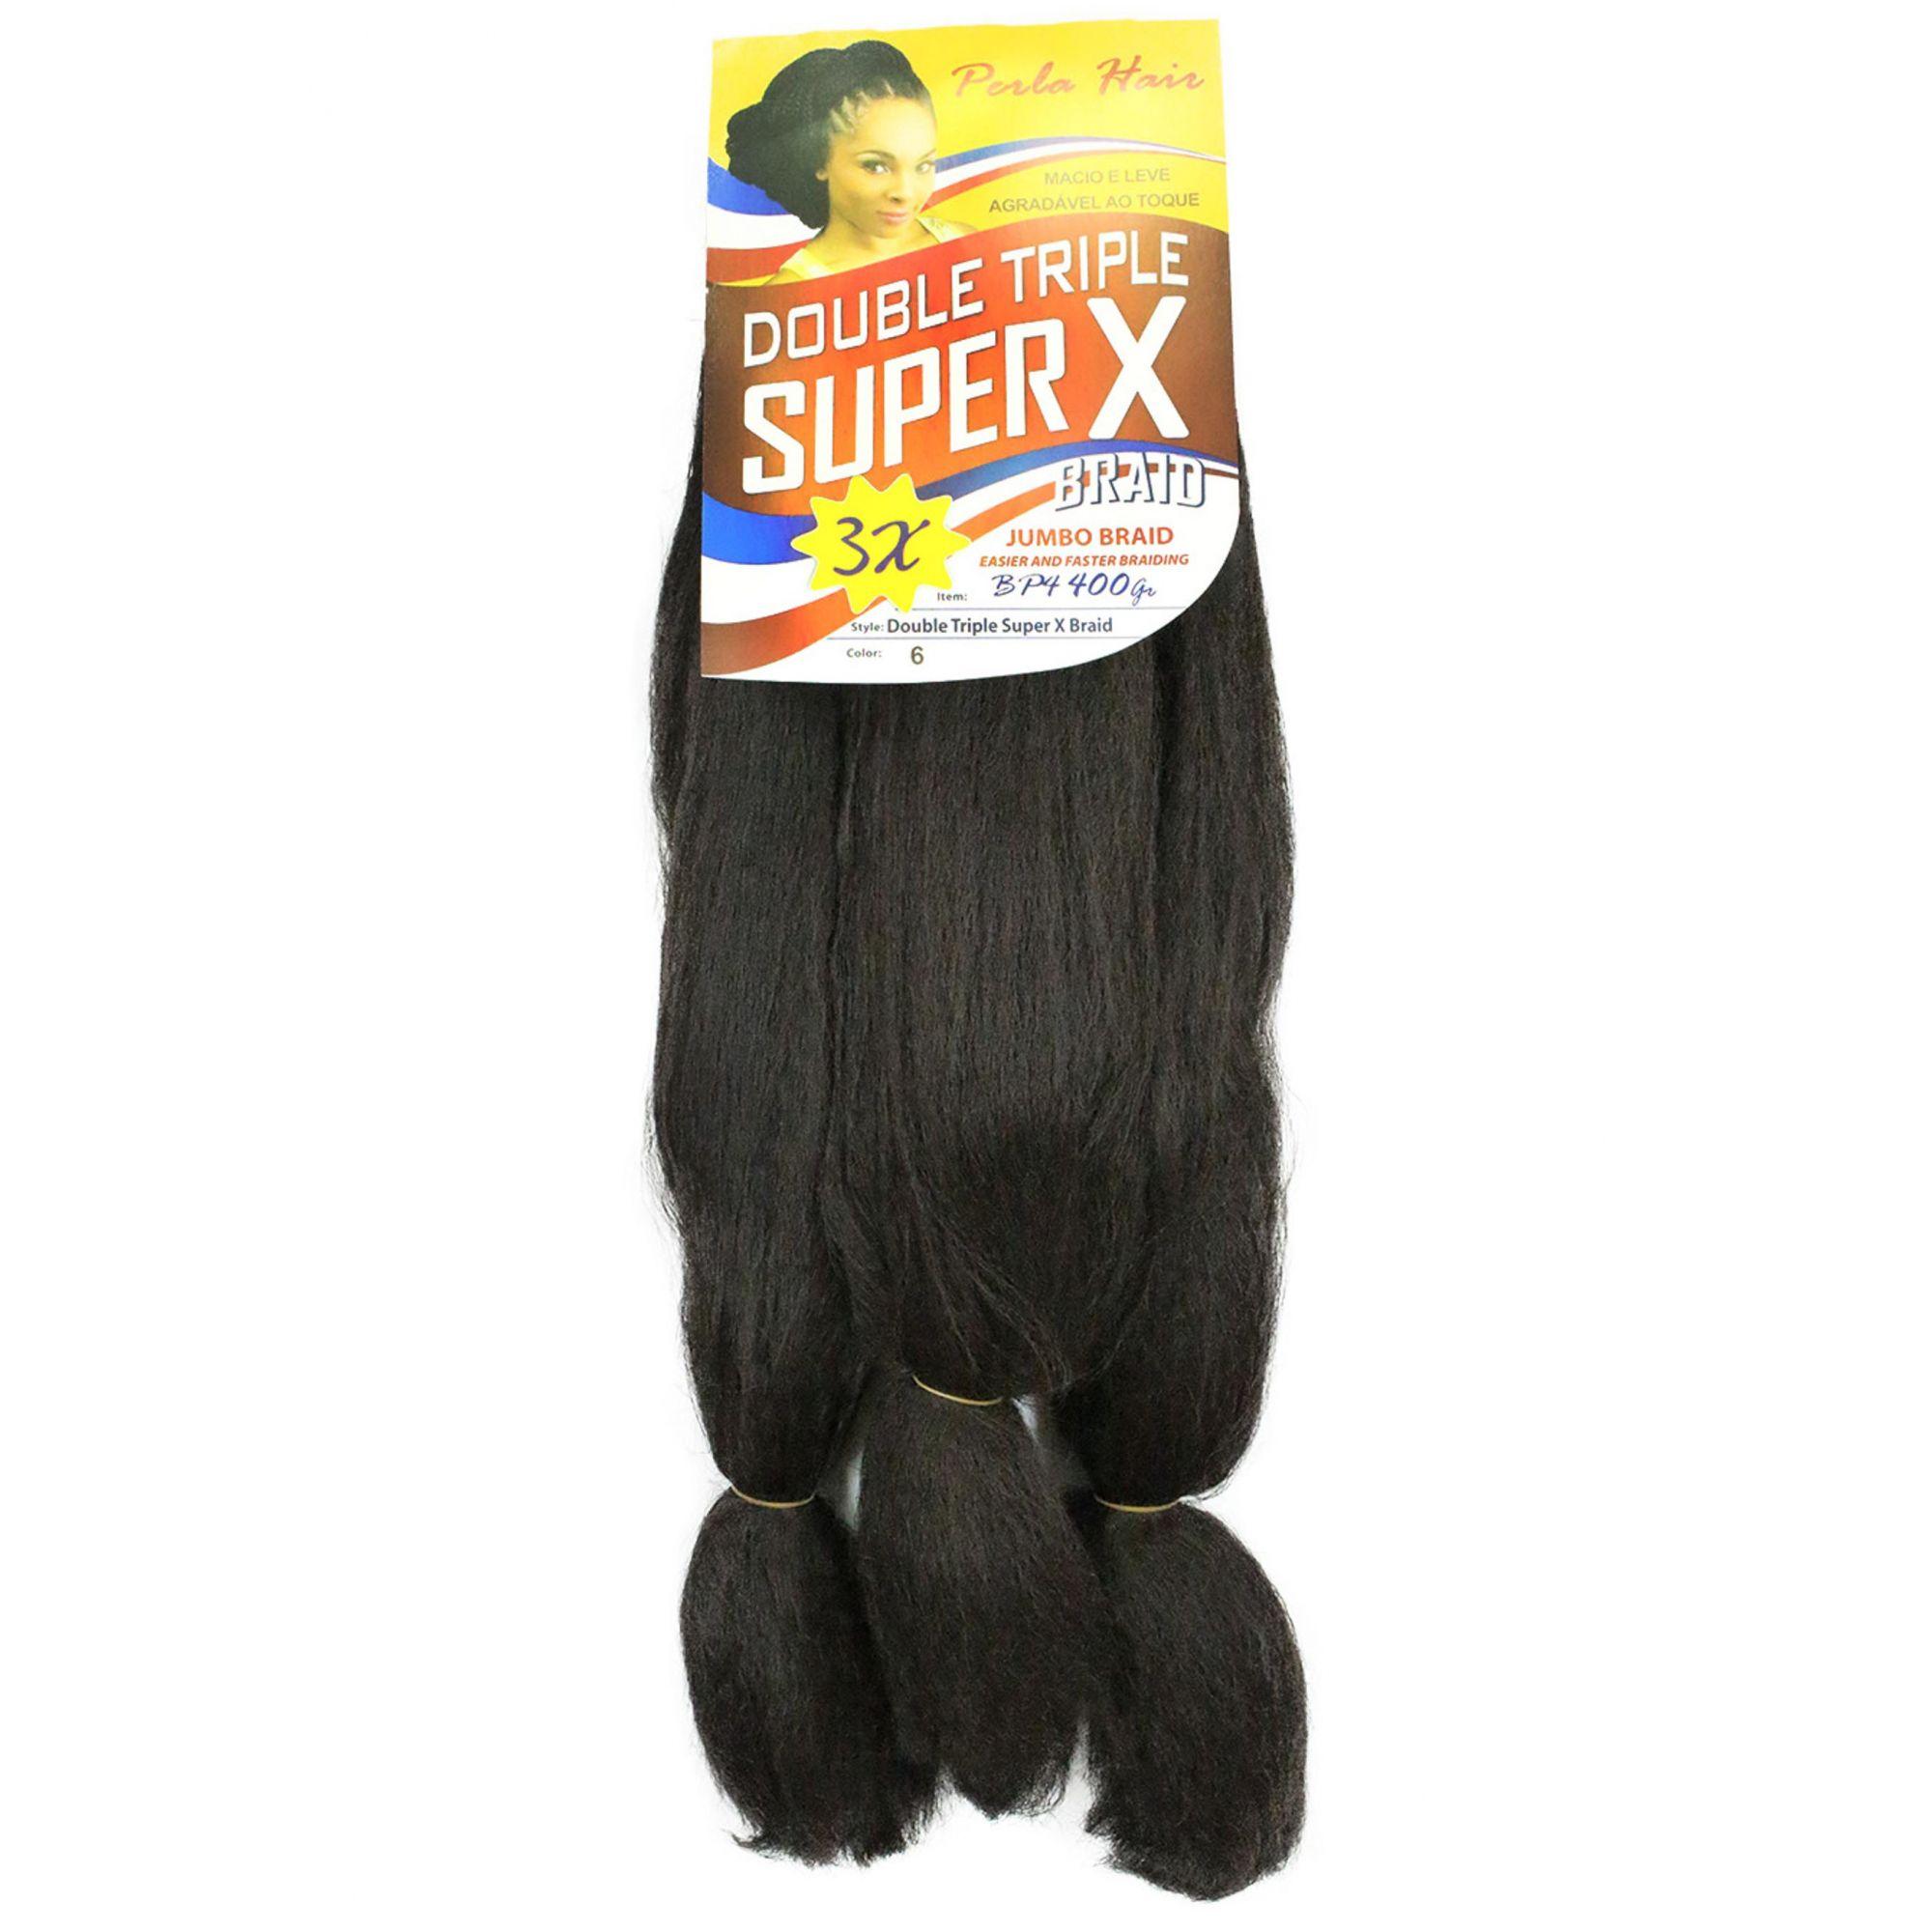 Cabelo Sintético - Zhang hair jumbo - Super X (300g)